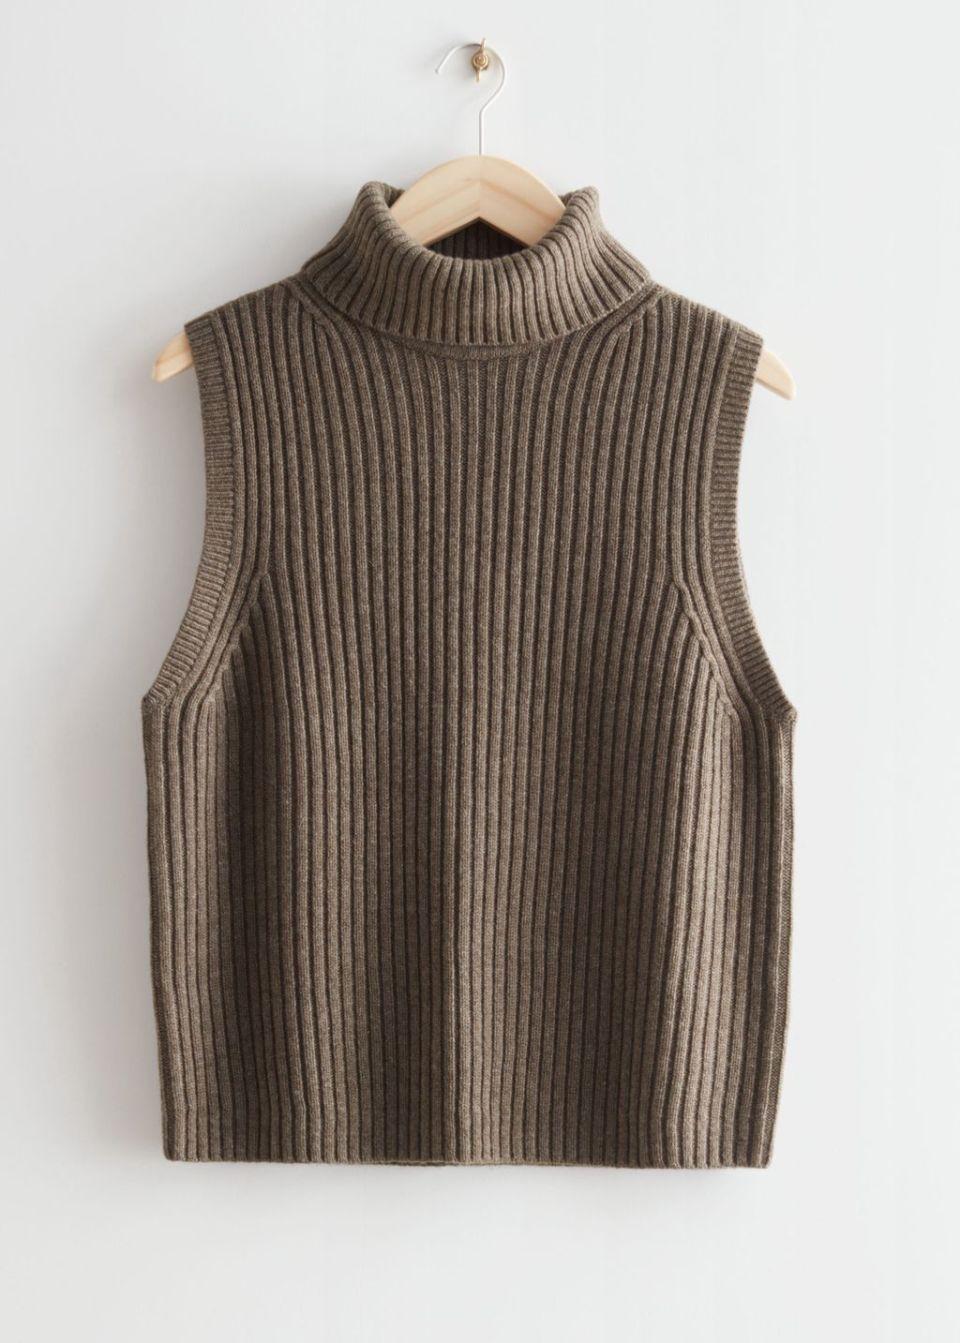 Turtleneck Wool Knit Vest